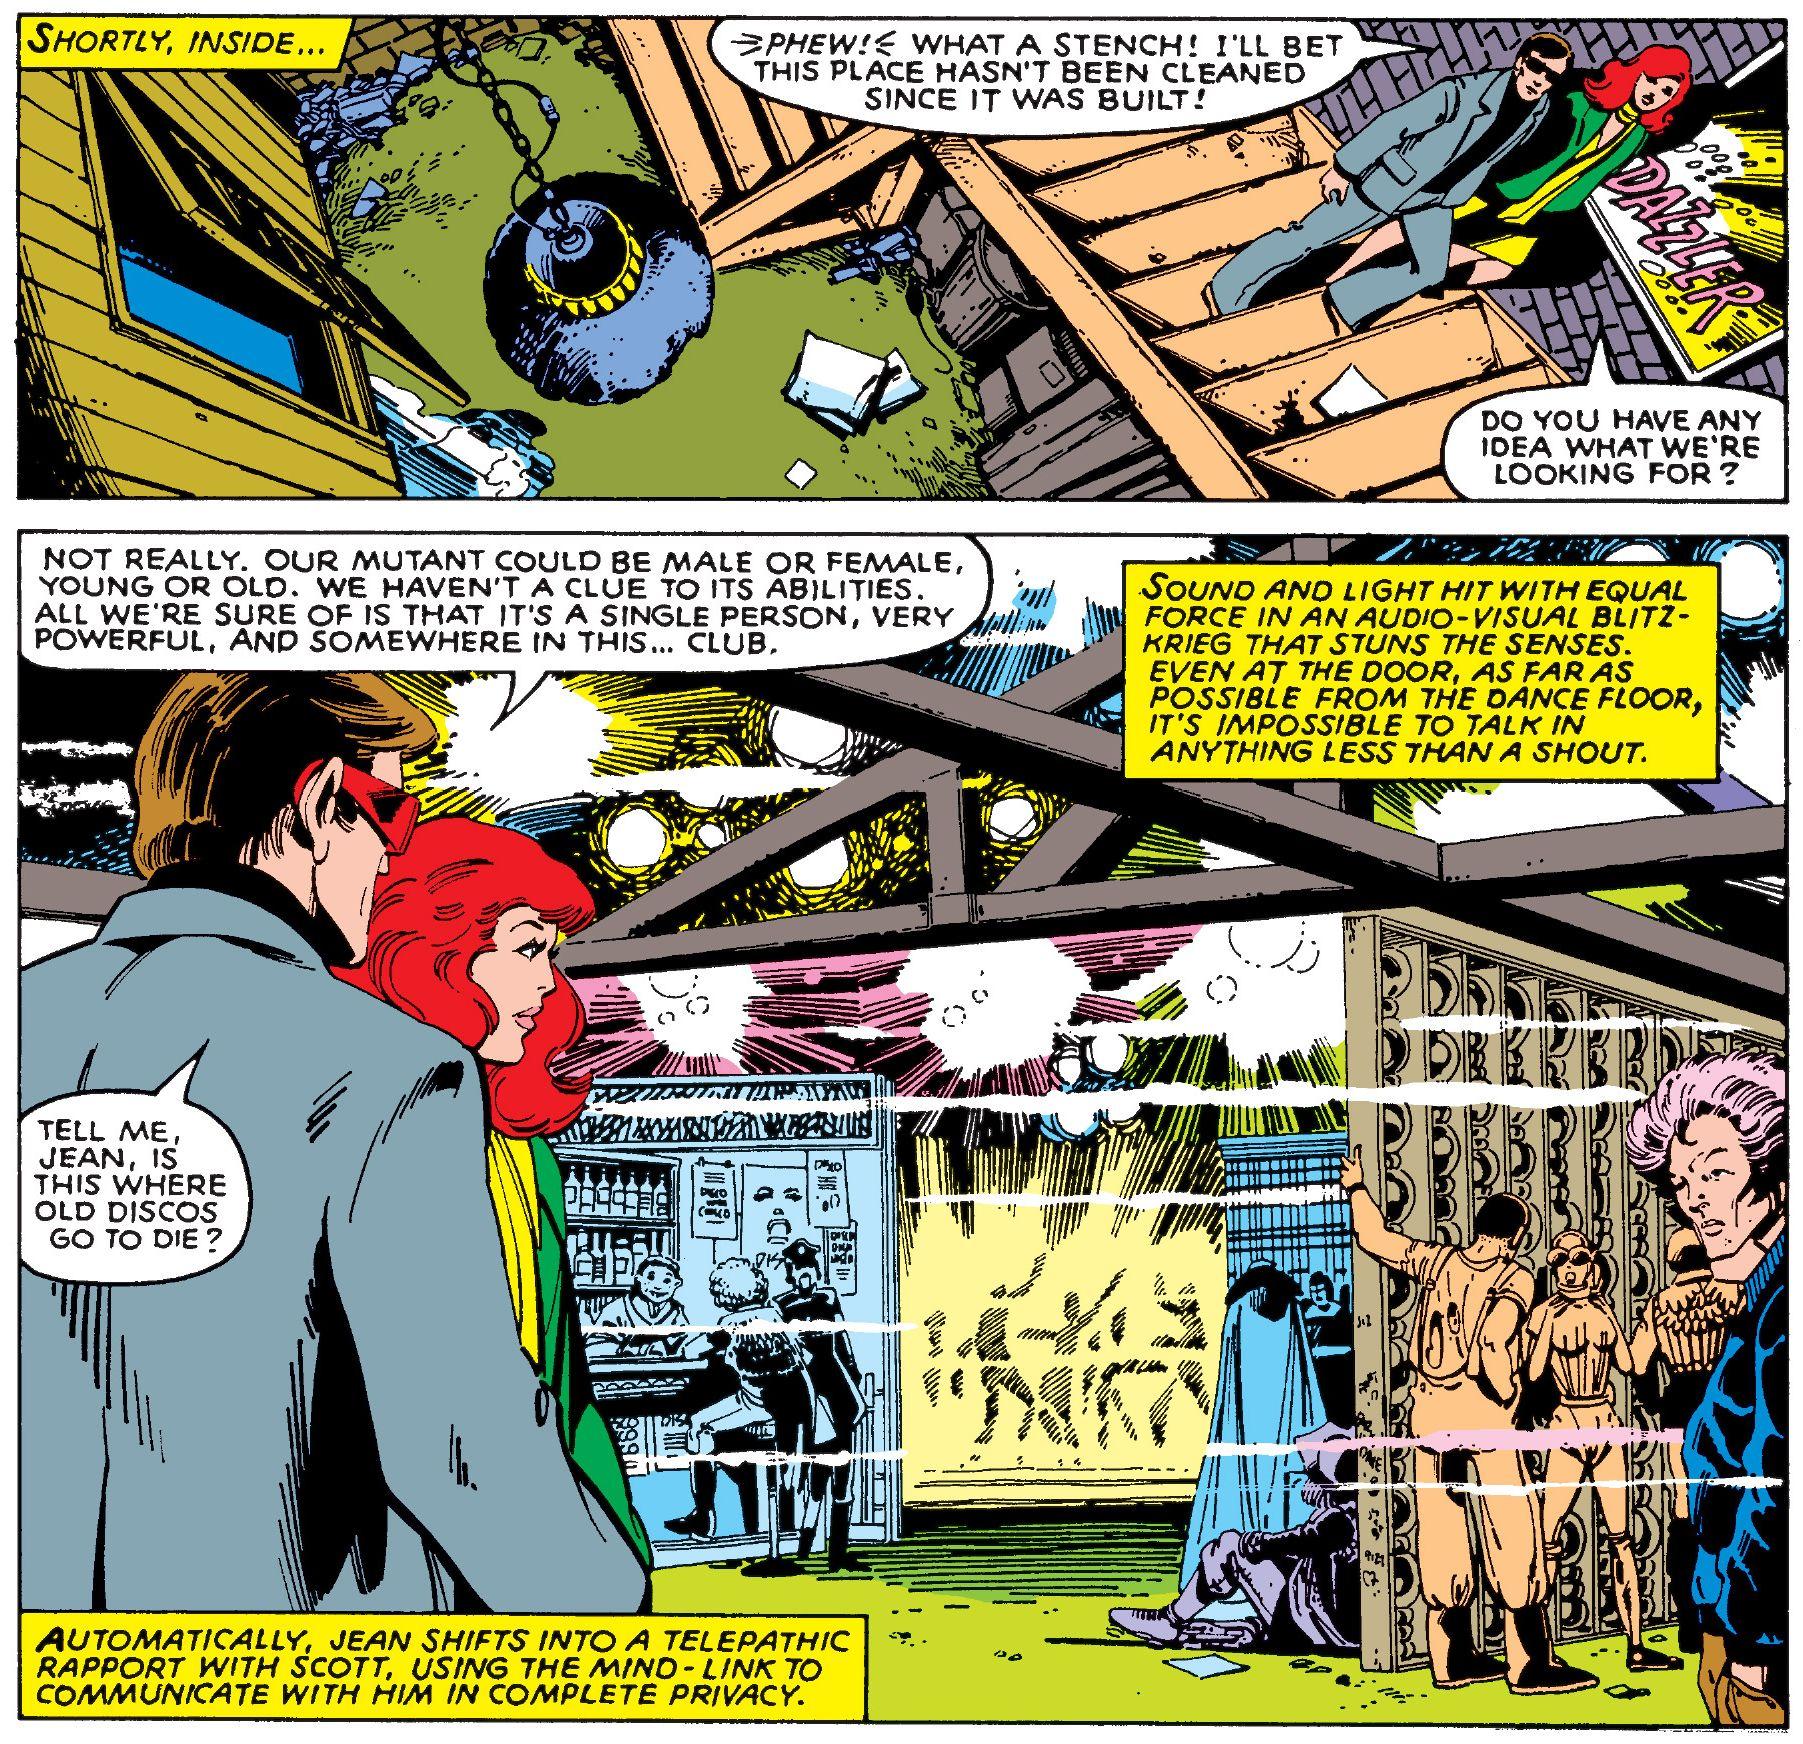 Uncanny X-Men  #130 (Marvel, February 1980), page 3